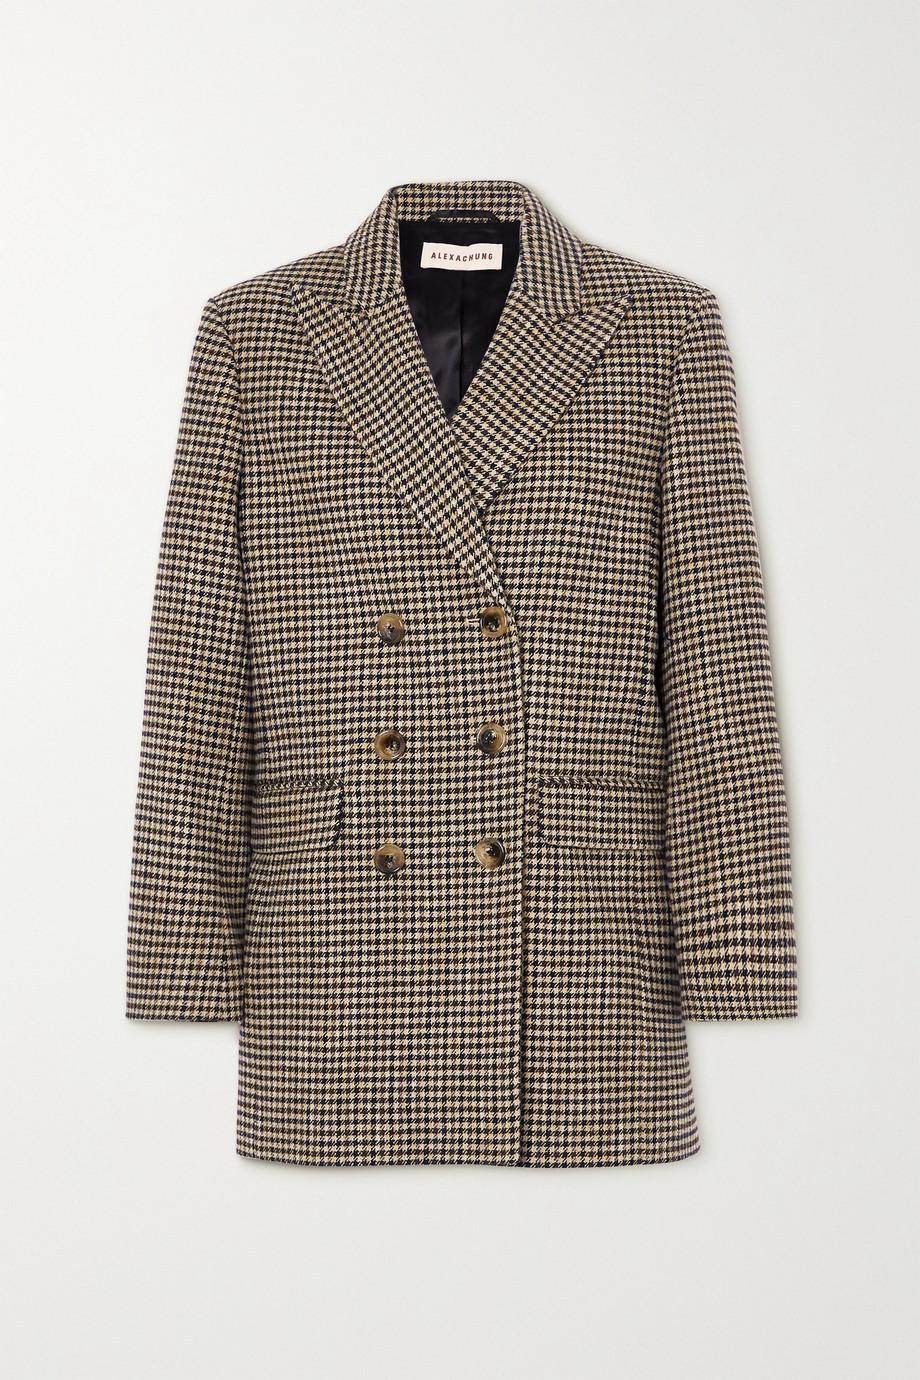 ALEXACHUNG Jerry 双排扣千鸟格棉质混纺西装式外套